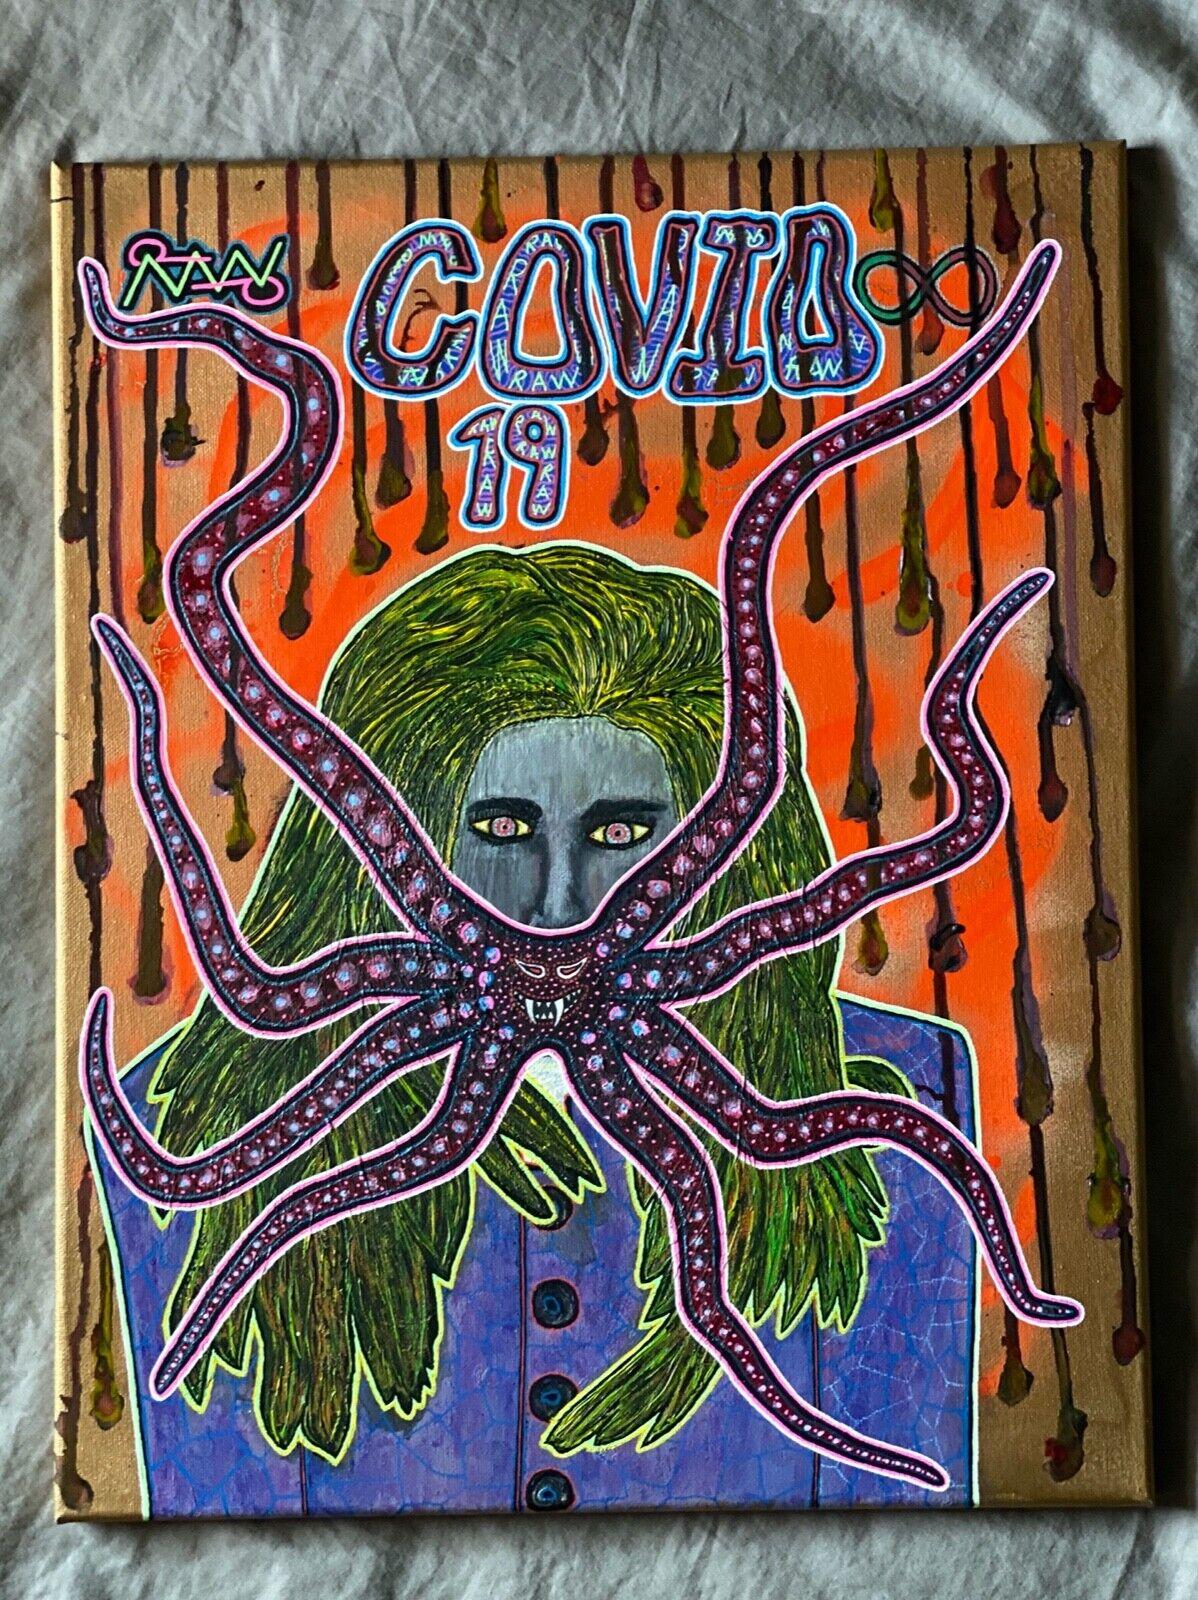 Contemporary Art C0VID-19 Spray, Acrylic Canvas RabidArtWork NYC Graffiti  - $350.00